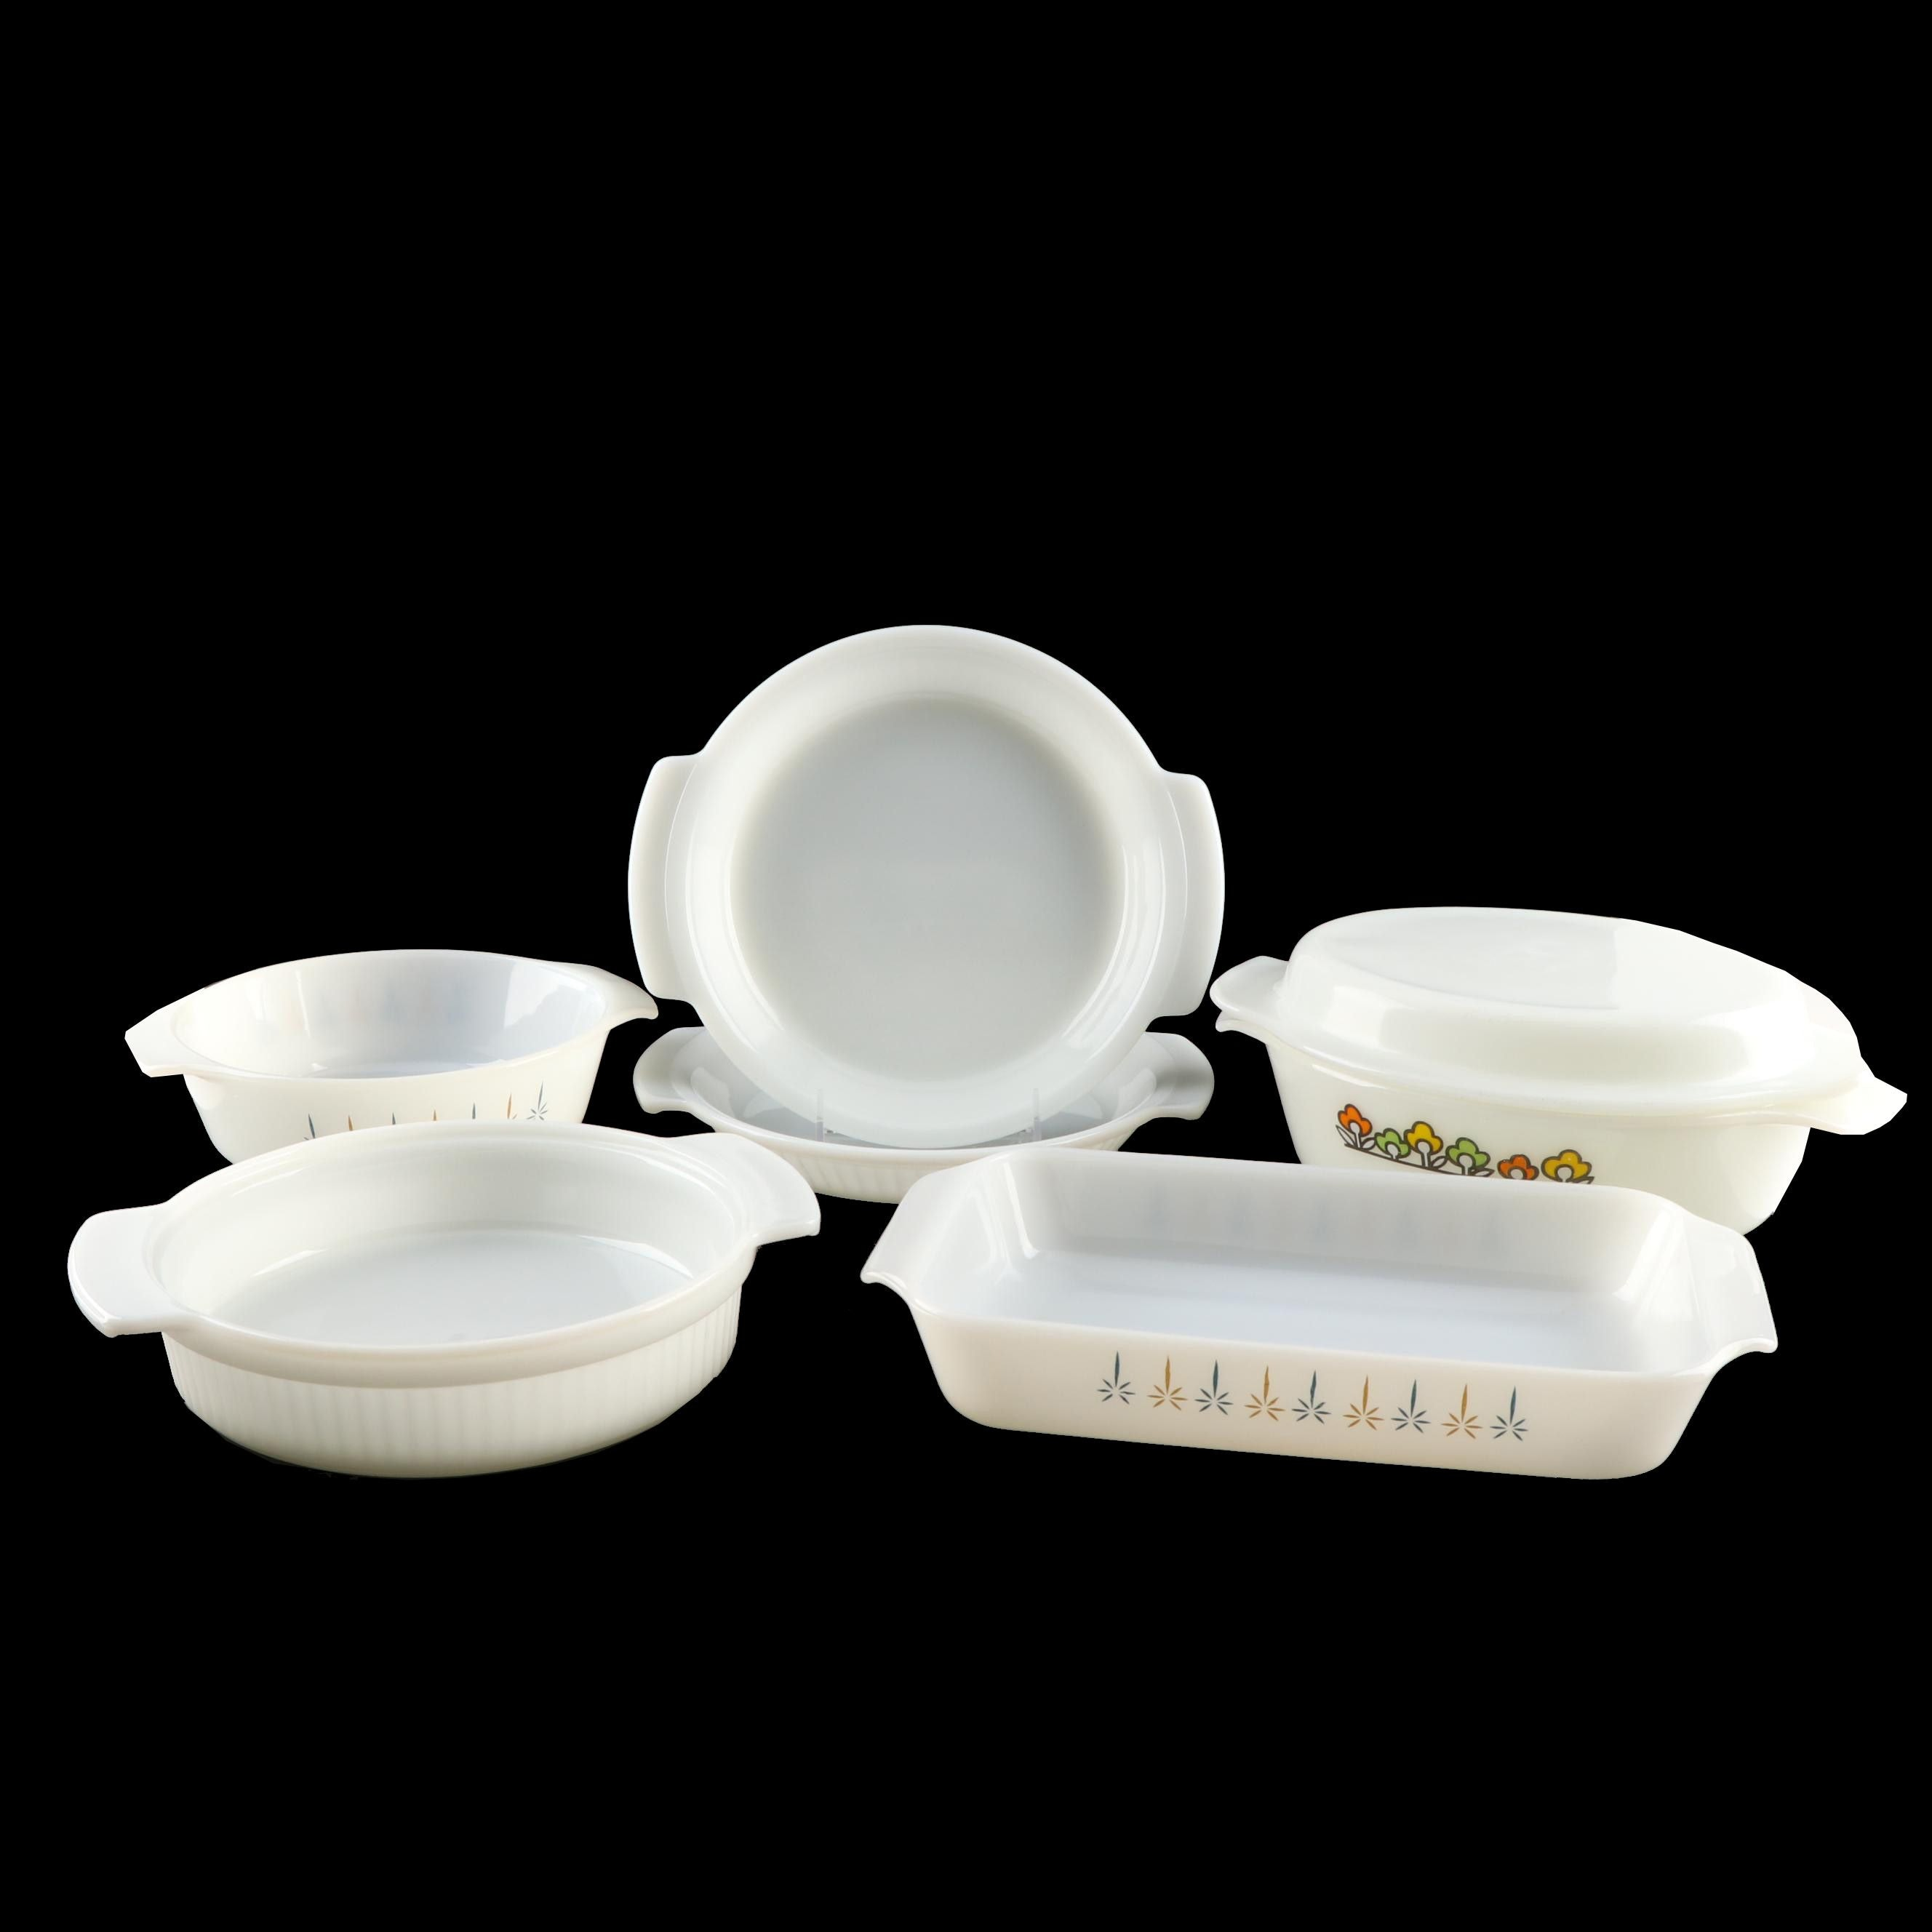 Fire King Milk Glass Bakeware, Mid-Century